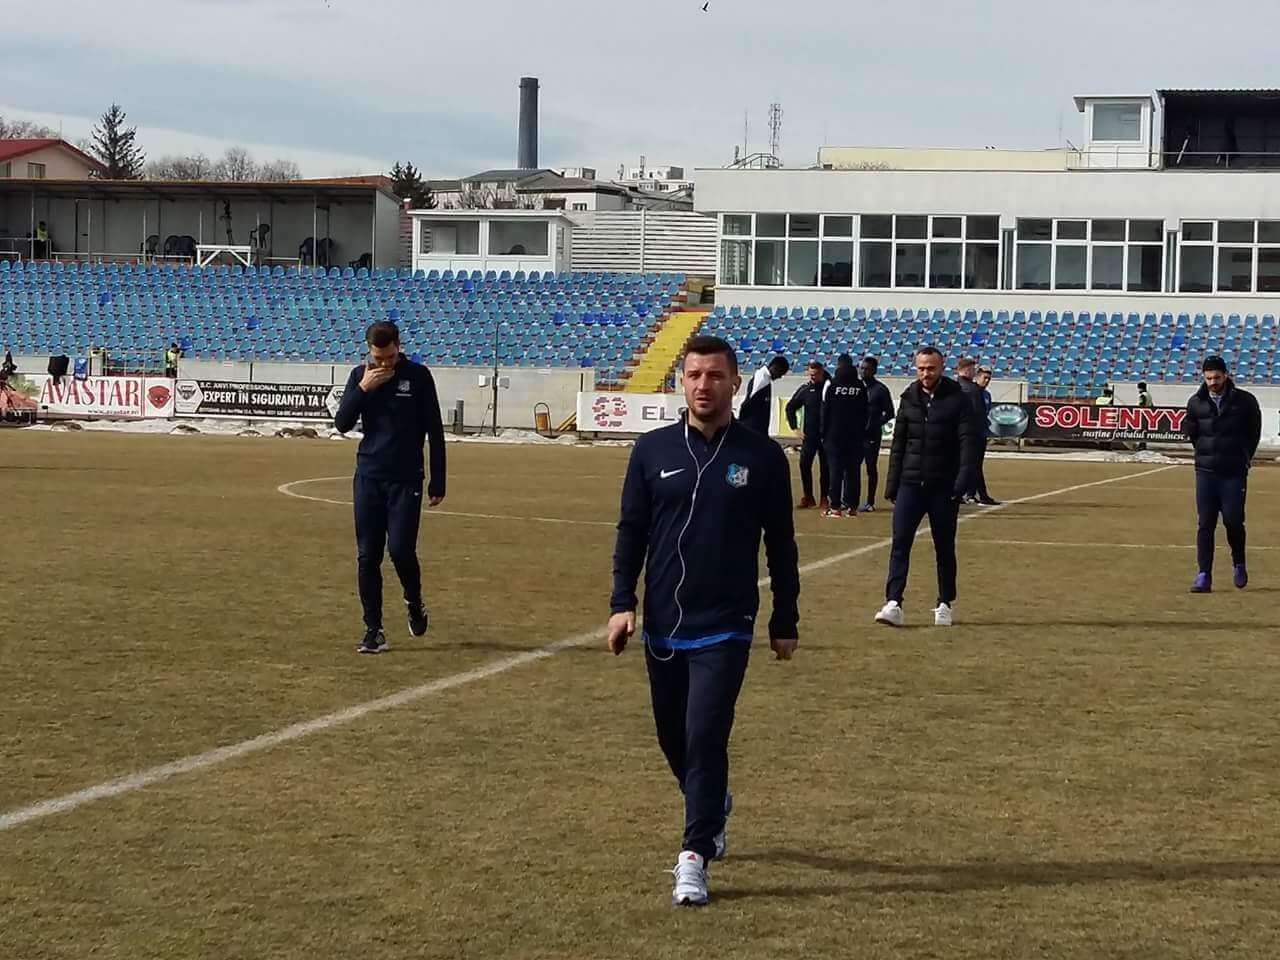 FC Botoșani - Pandurii 3-1.Gorjenii fără victorie în 2017 FC Botoșani – Pandurii 3-1.Gorjenii fără victorie în 2017 FB IMG 1488139730642